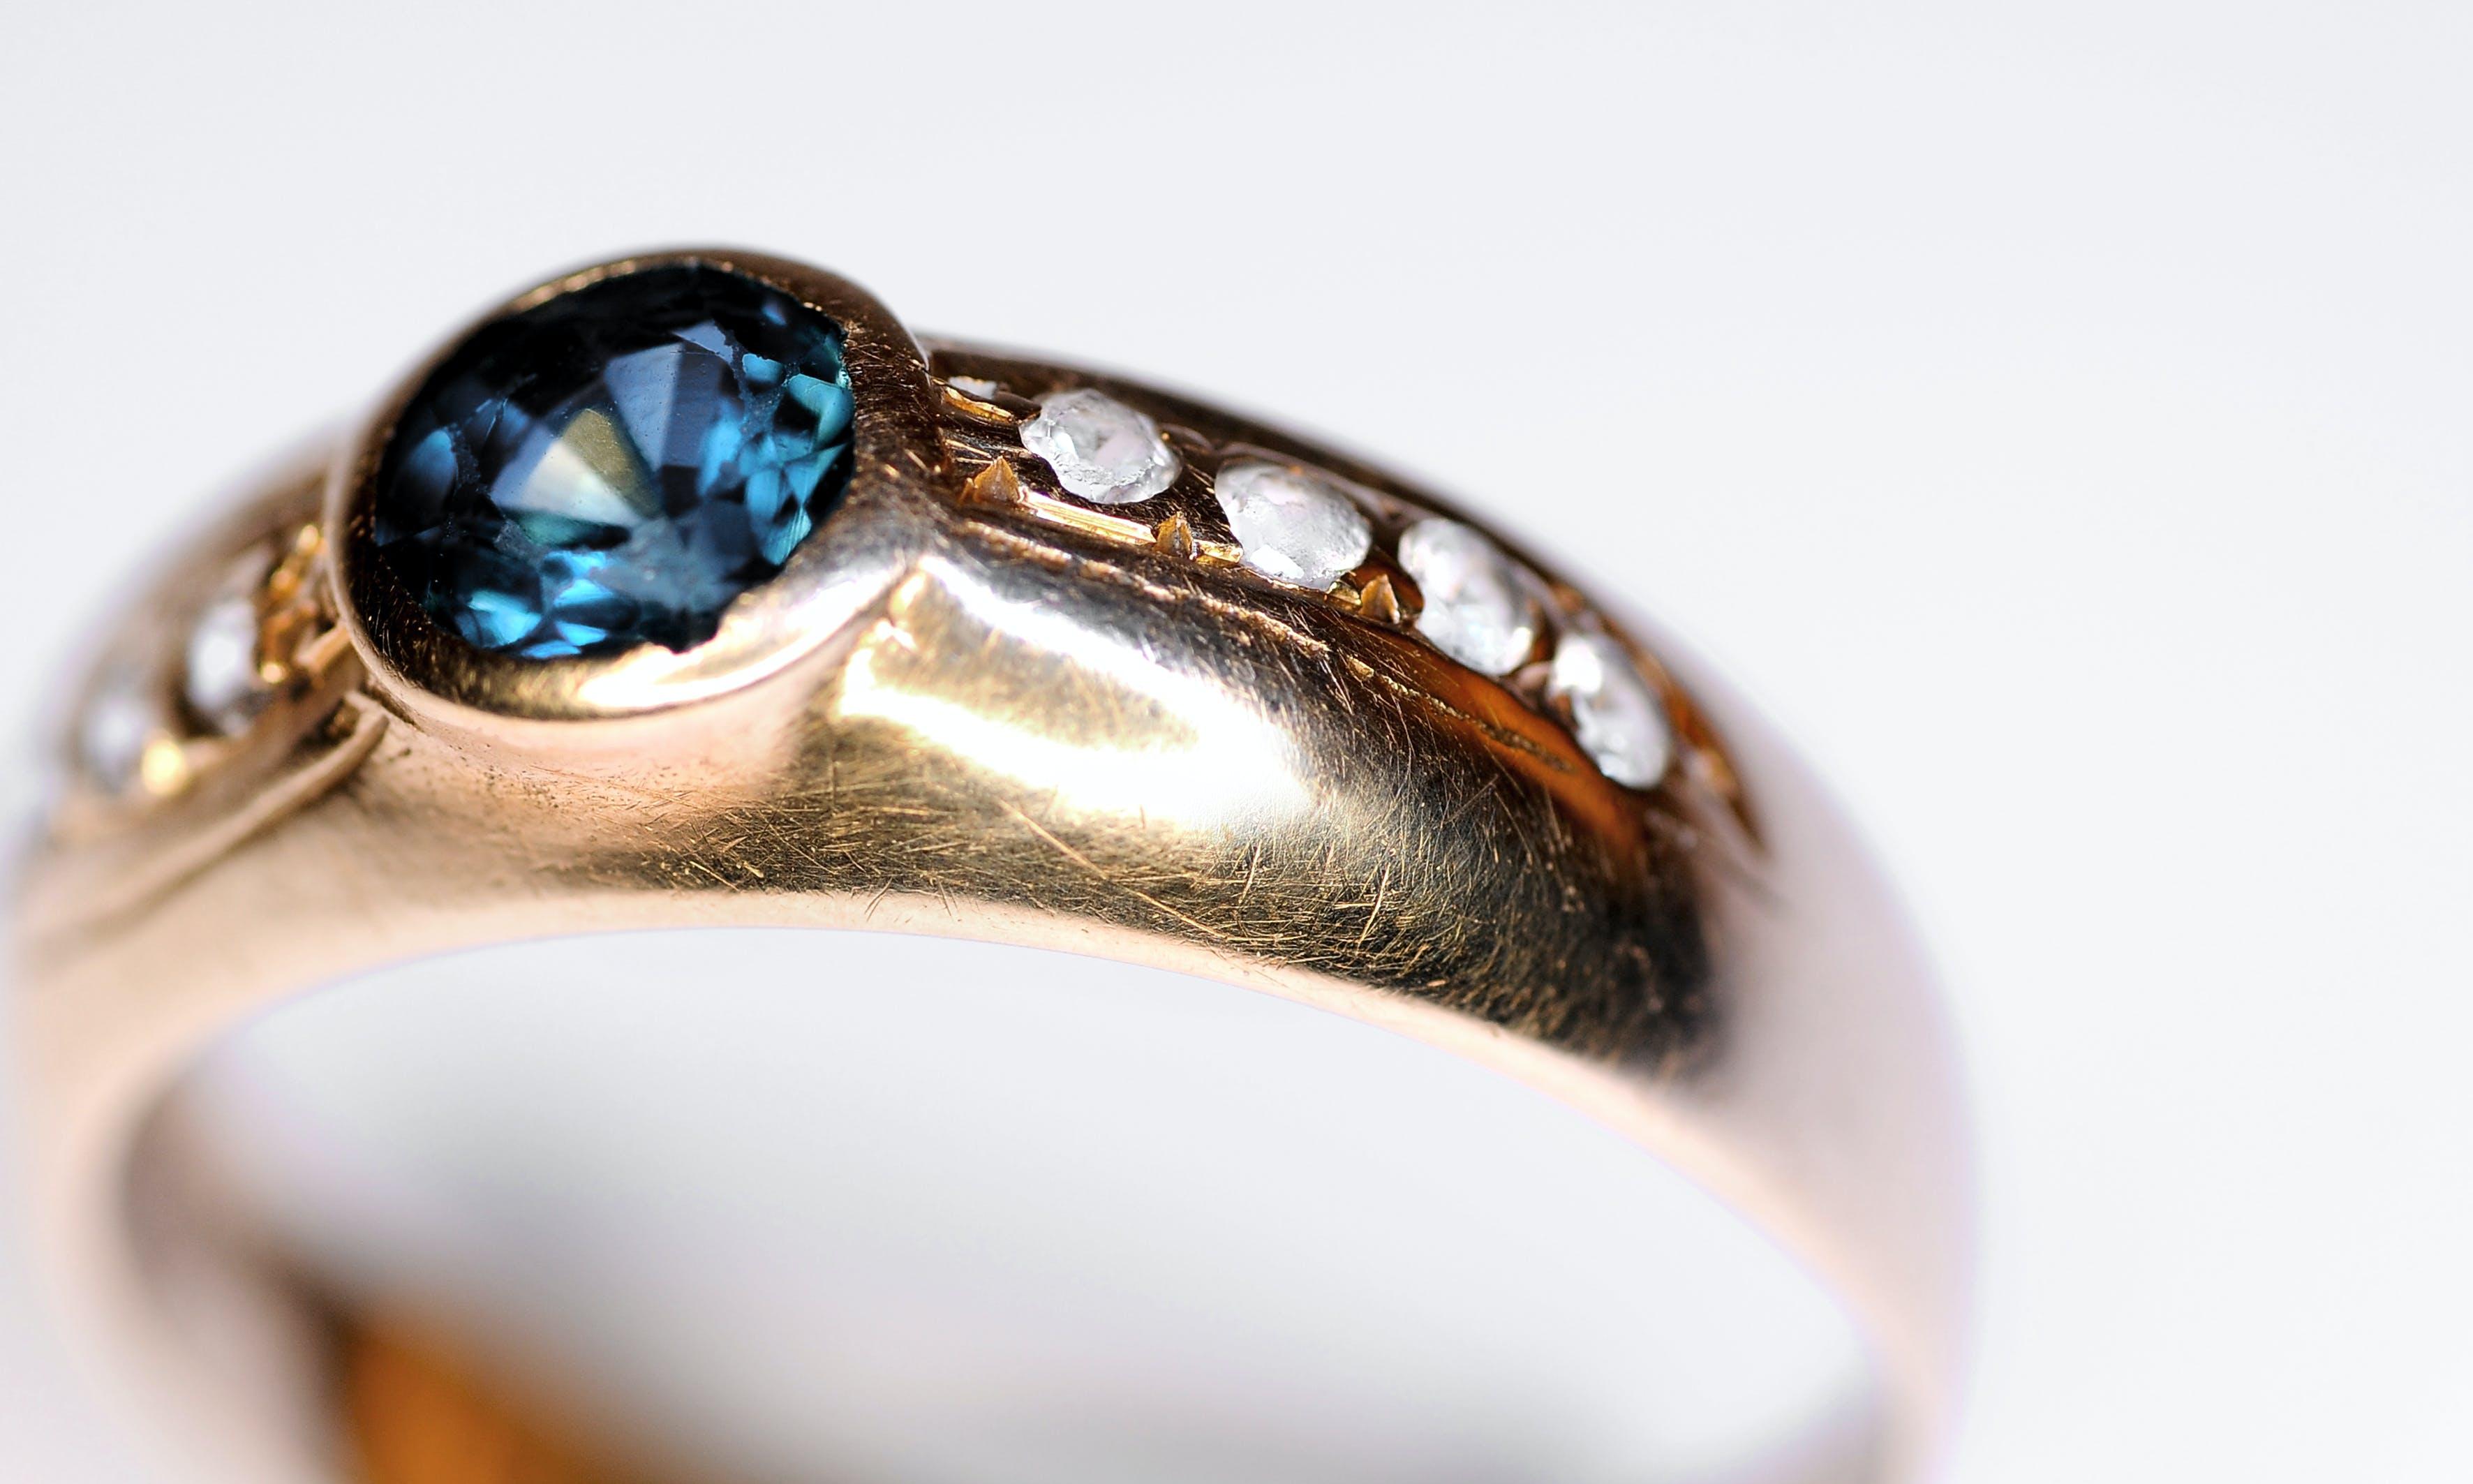 Free stock photo of Old Sapphire & Diamond ring